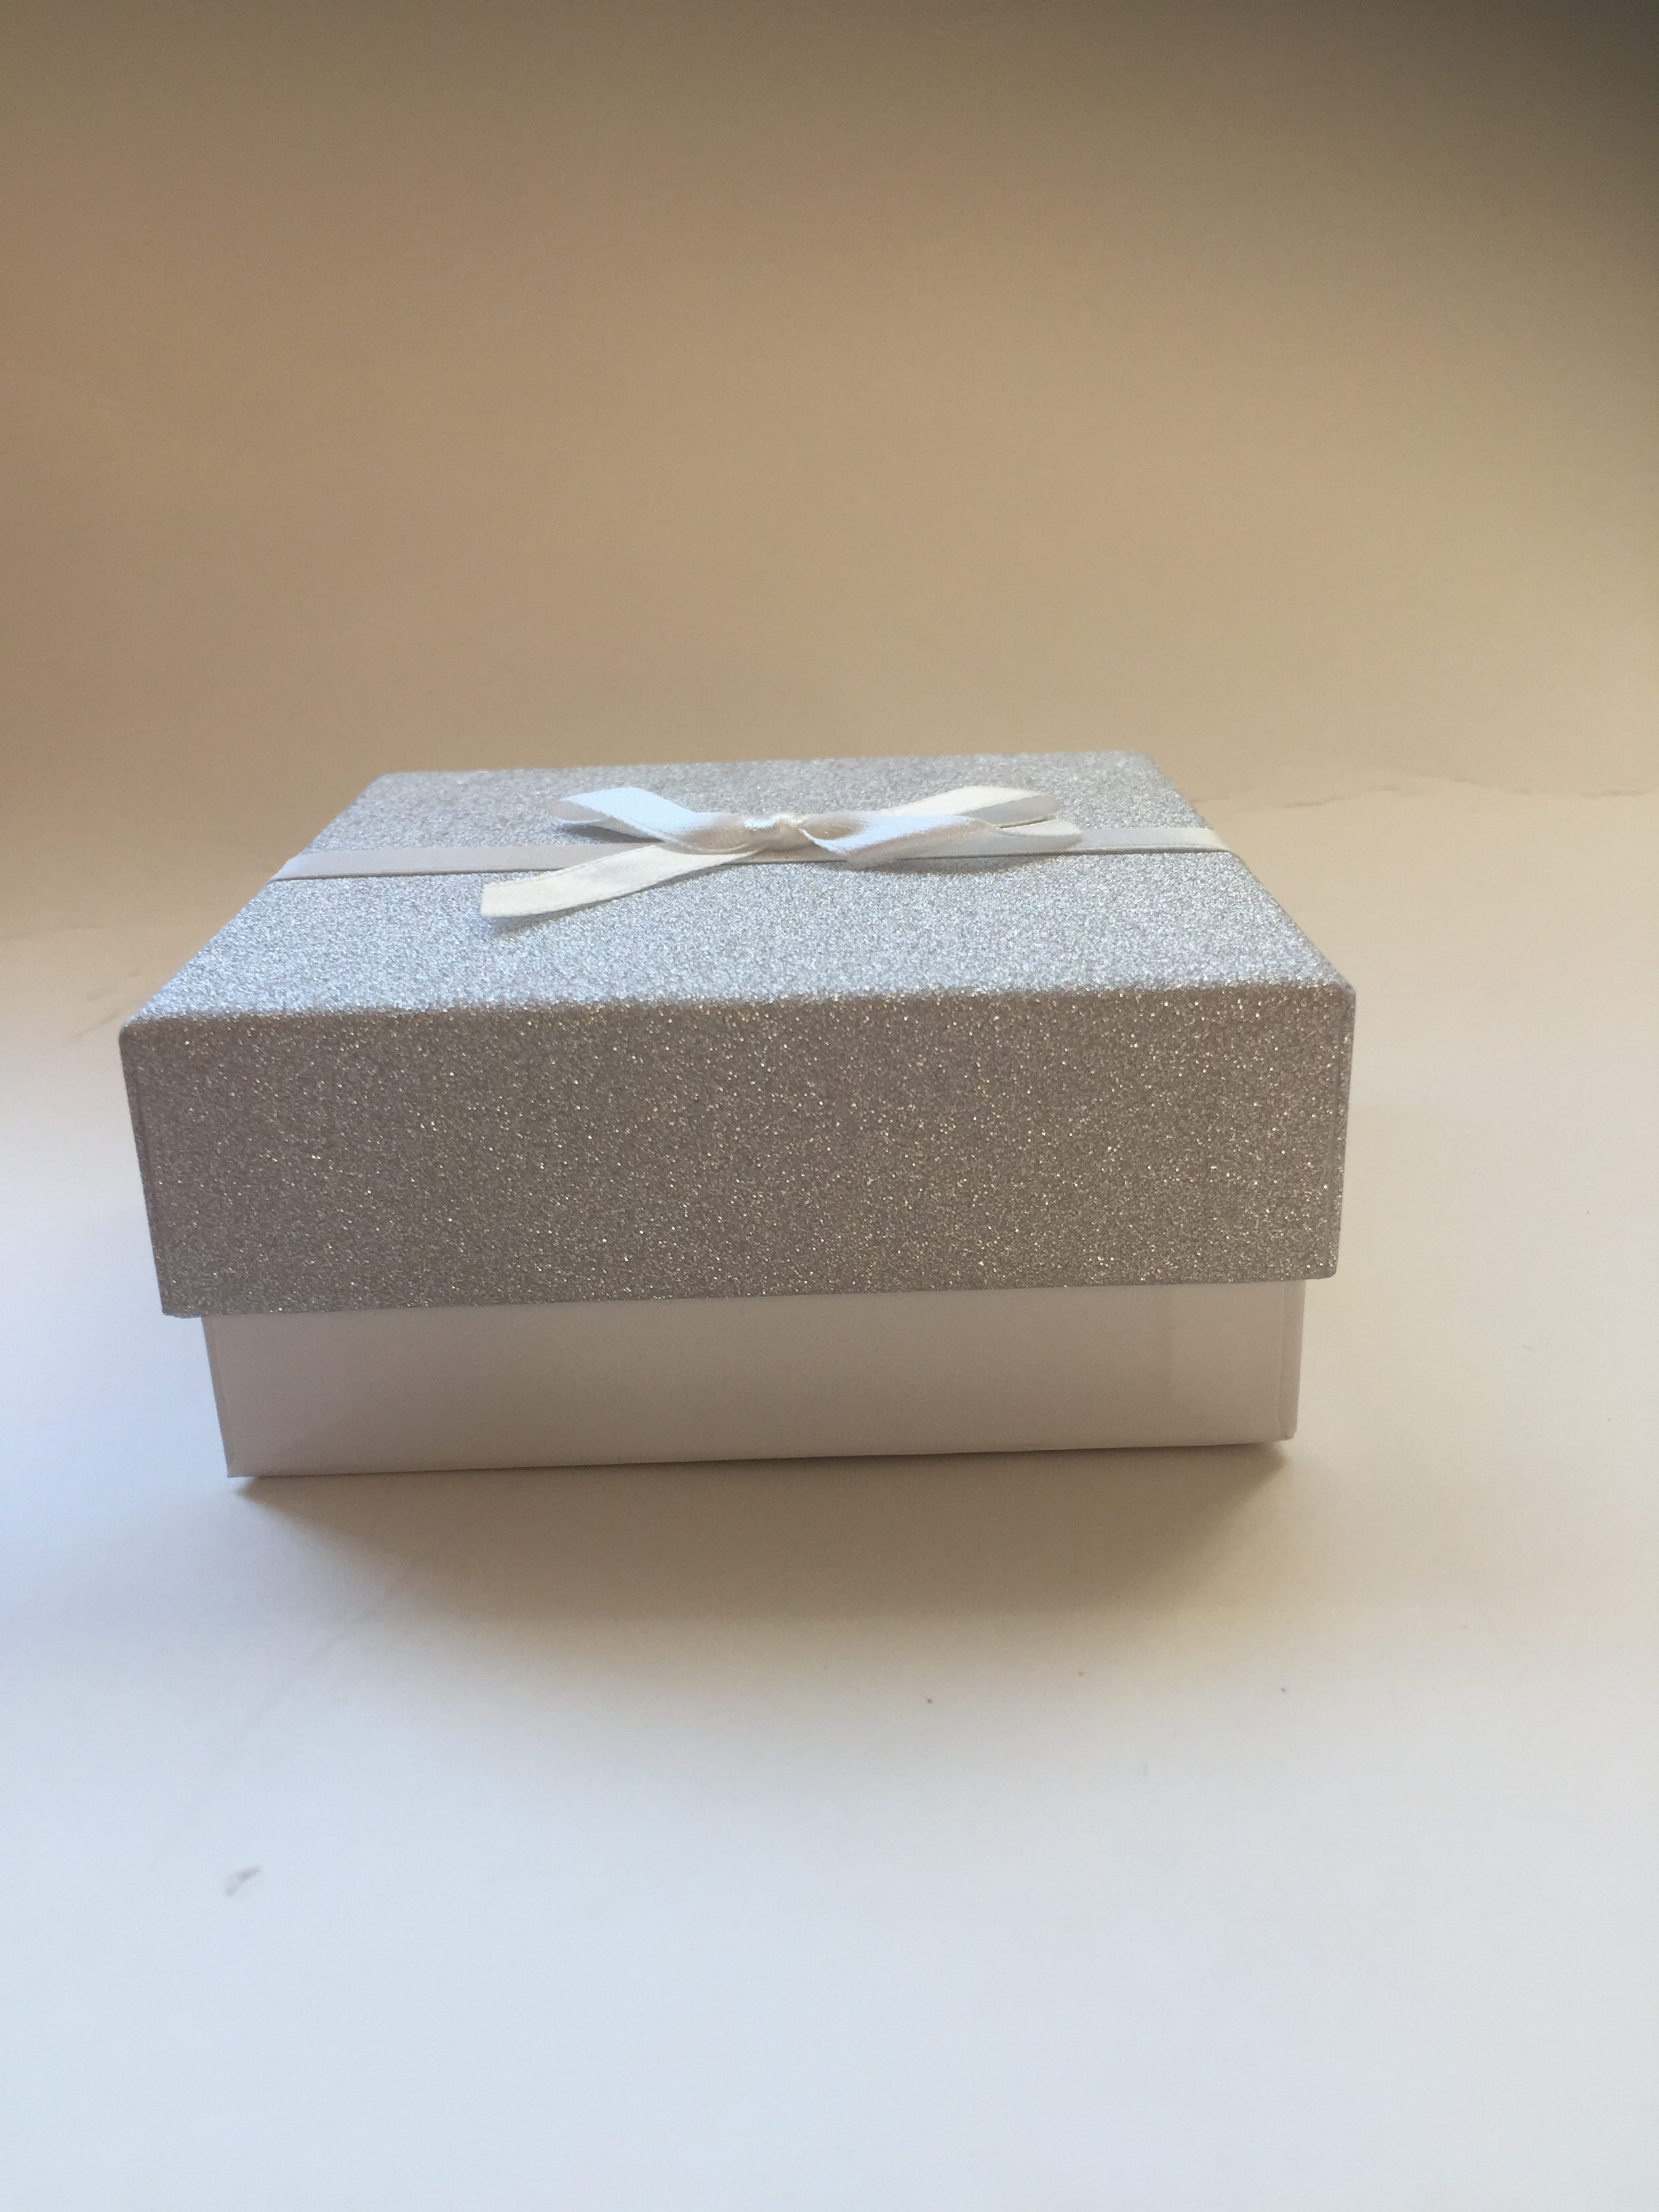 ... Glitter Gift Box Return to Previous Page. lightbox & Silver Glitter Gift Box - The Spirit Shop